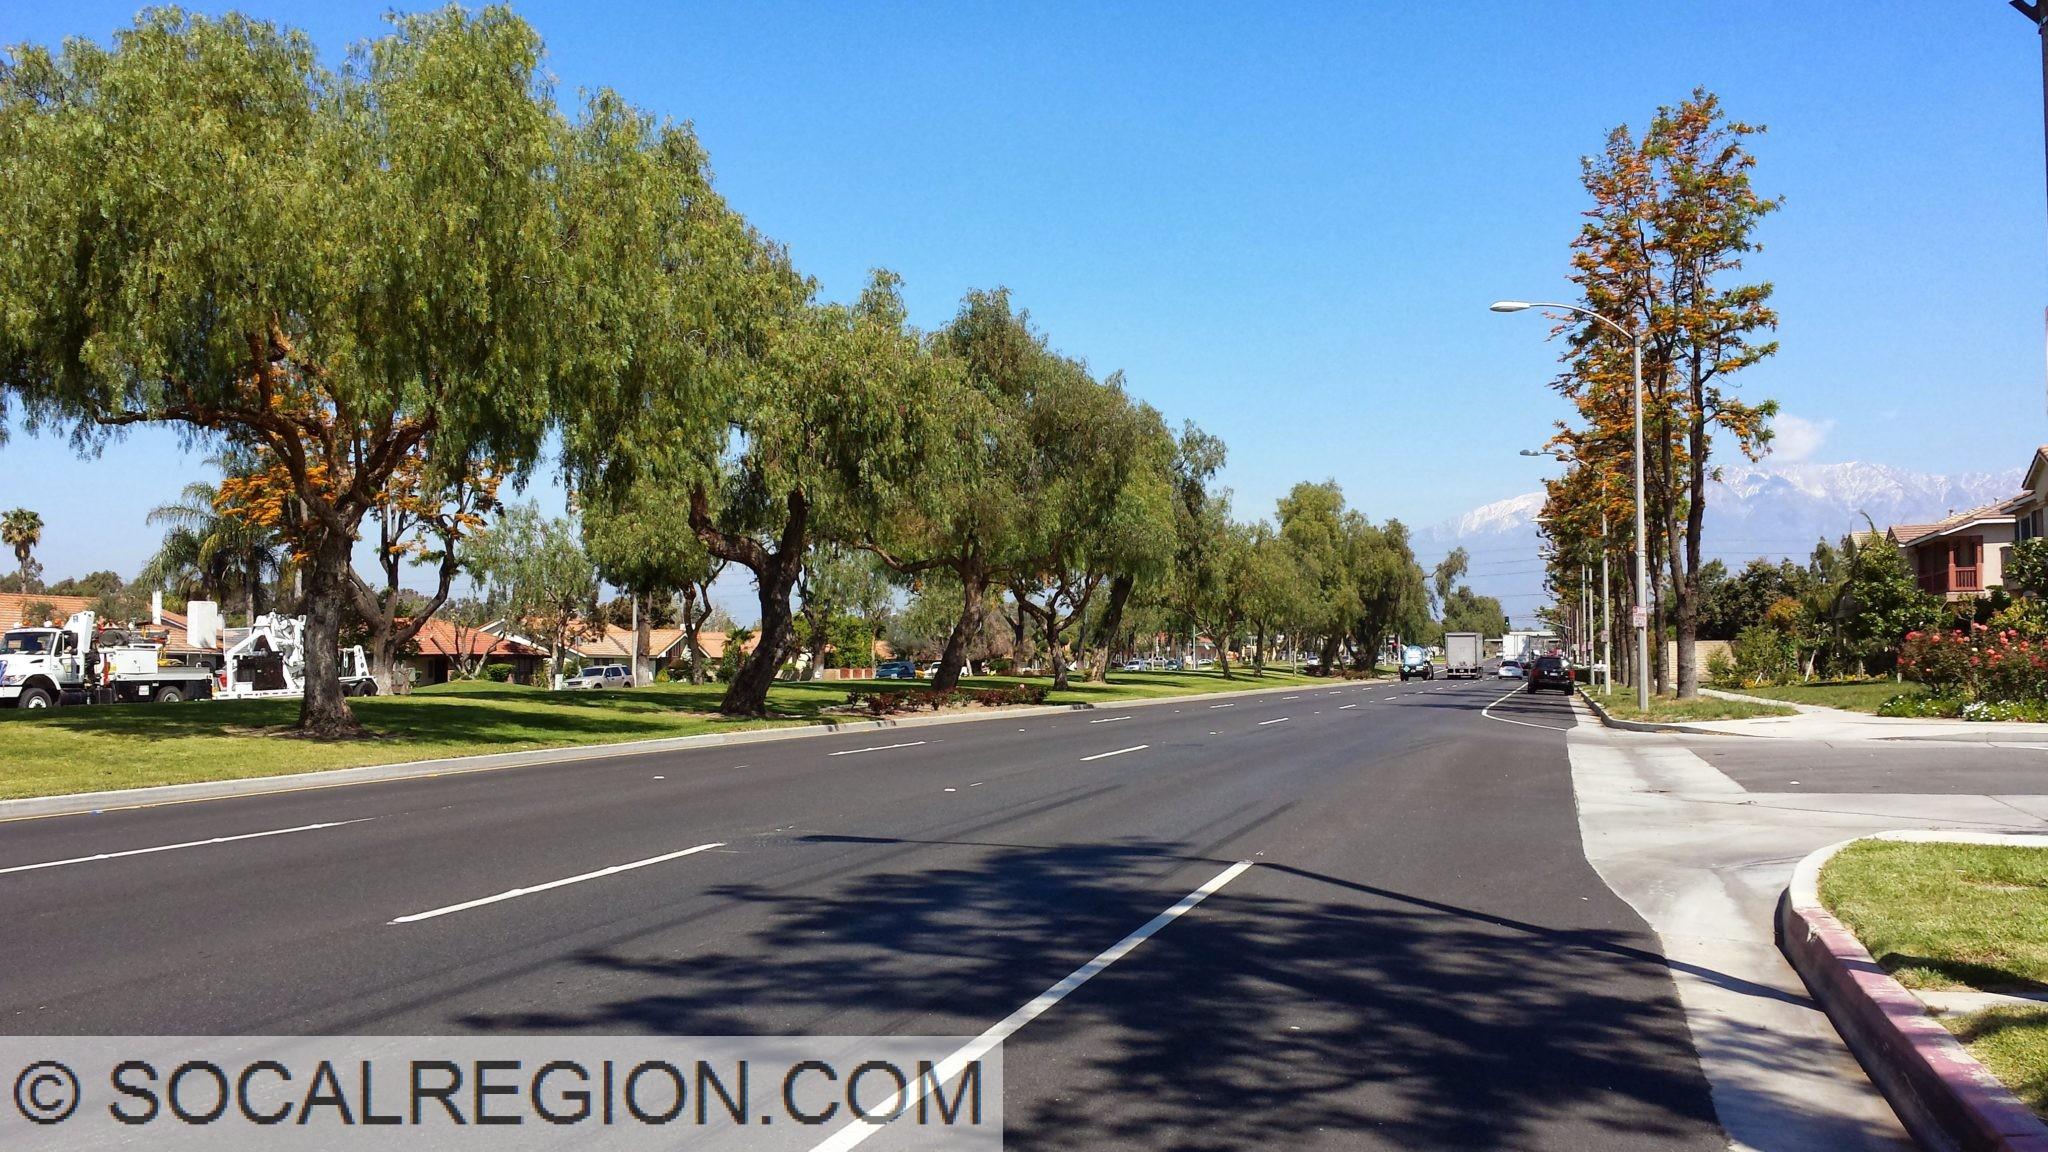 Sr 83 euclid avenue southern california regional rocks for Landscape rock upland ca